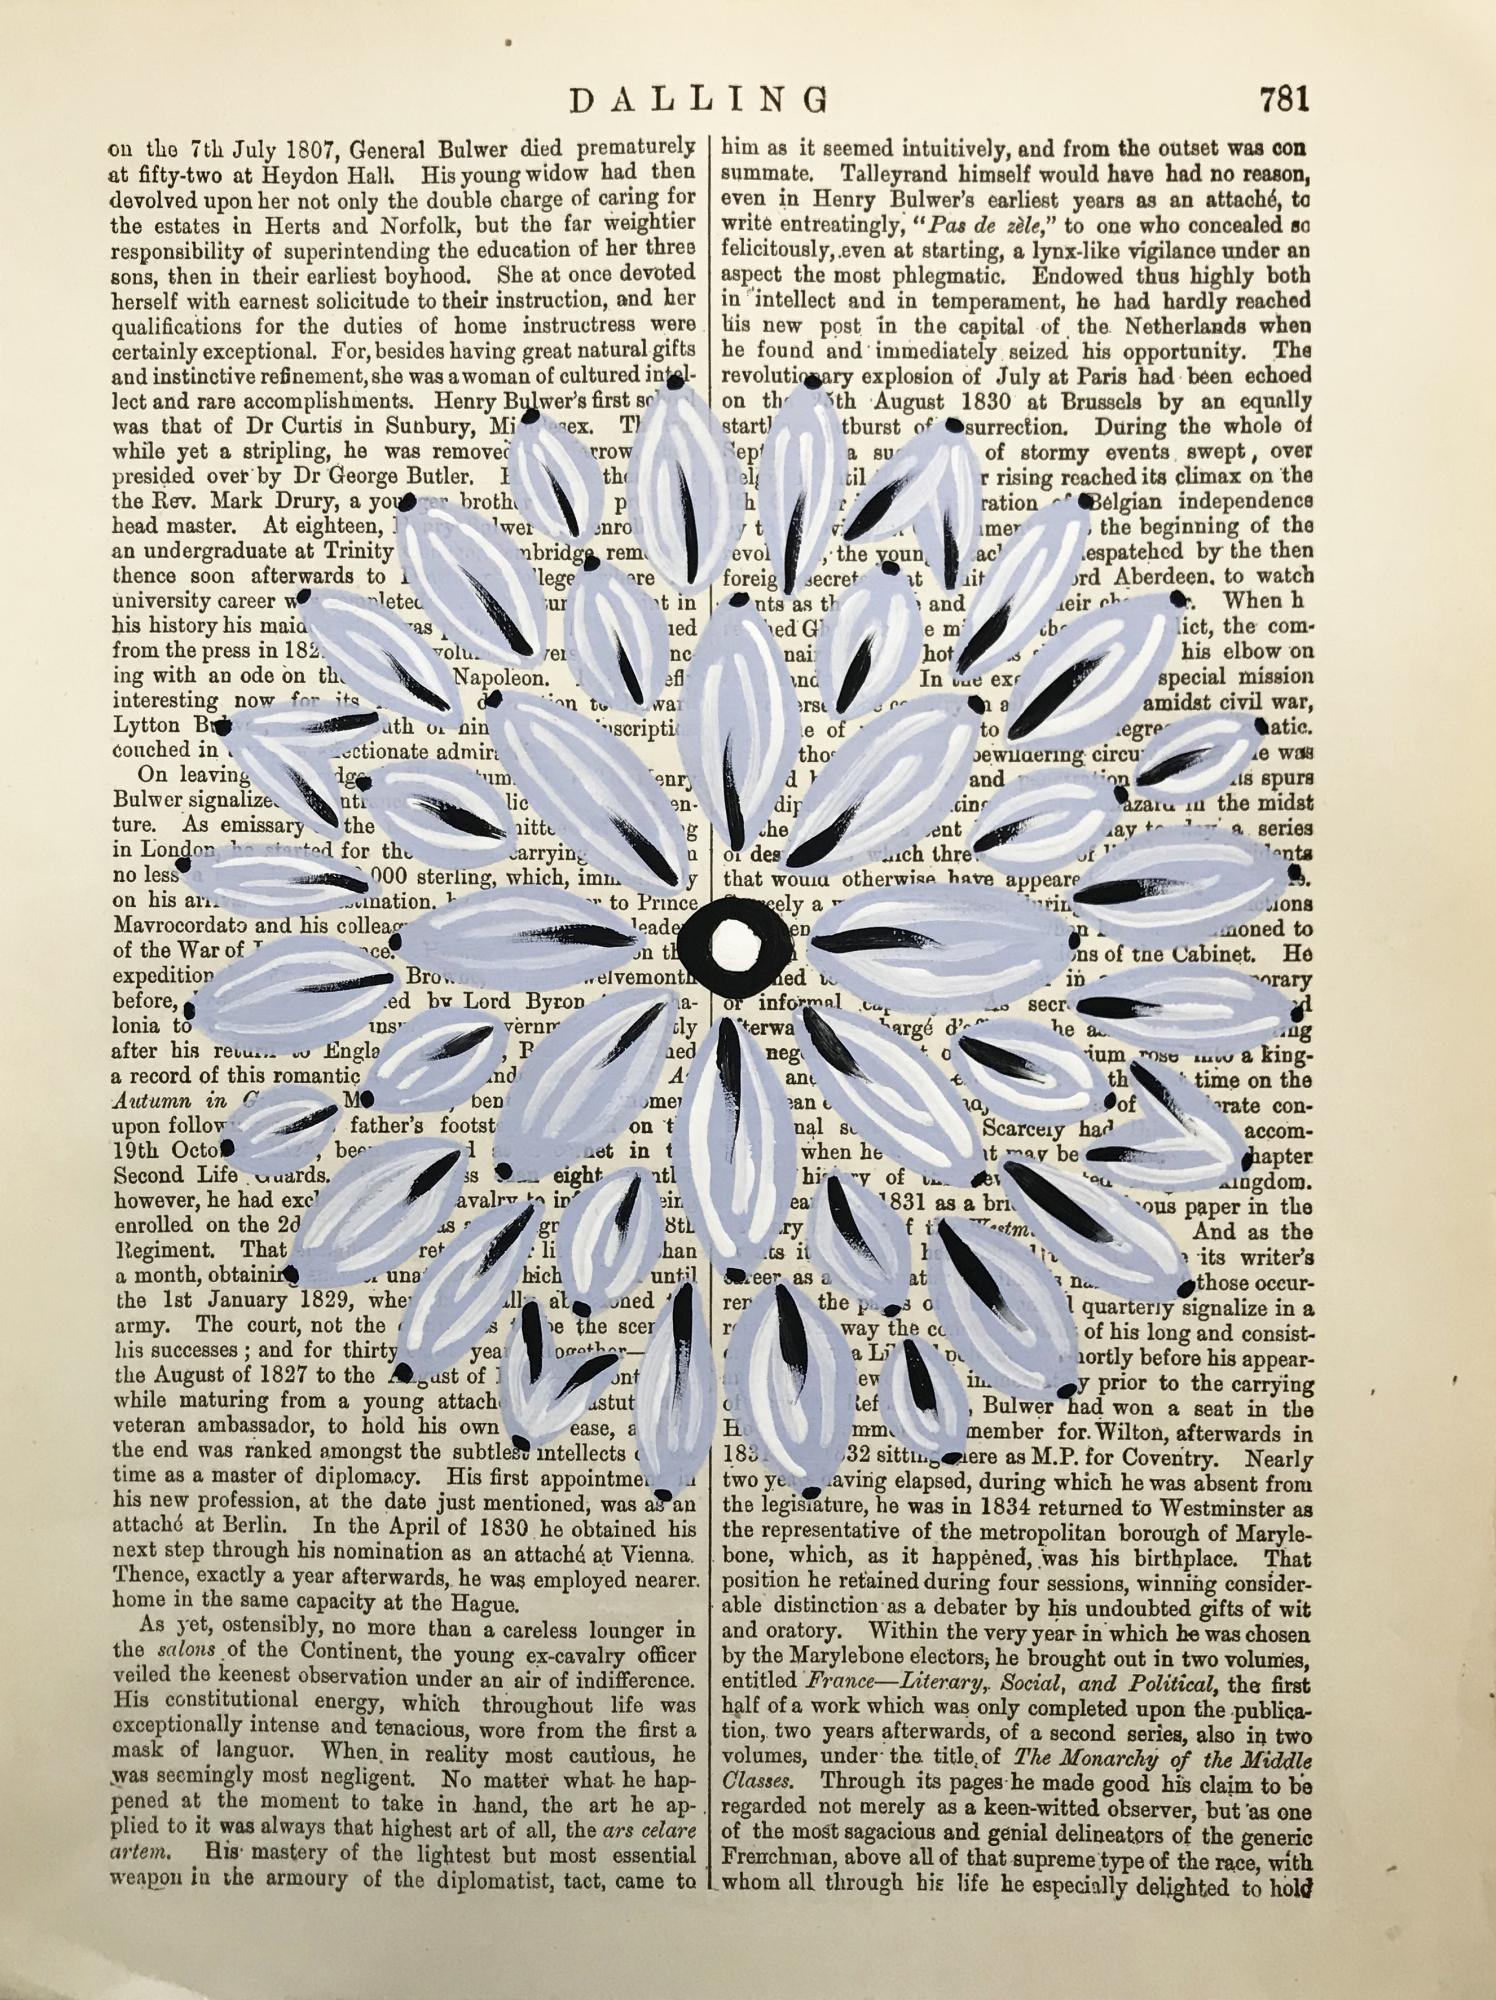 Calling grey 781 by Michela Sorrentino